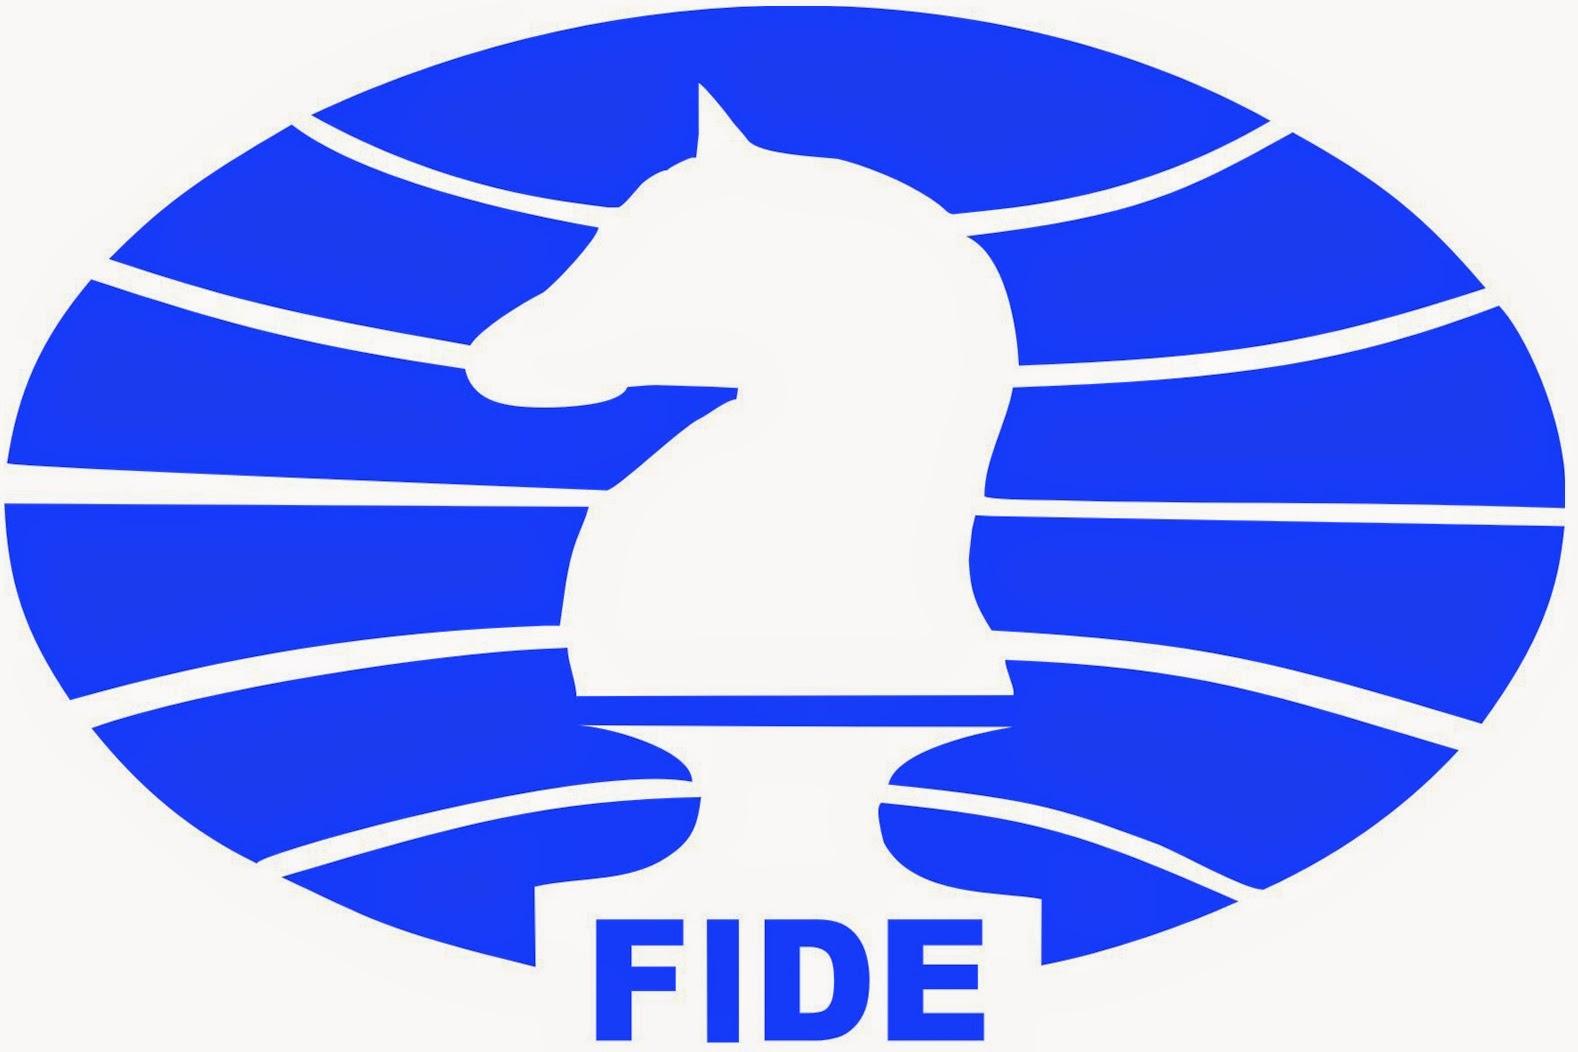 Resultado de imagen para campeonato mundial de ajedrez 2016 logo